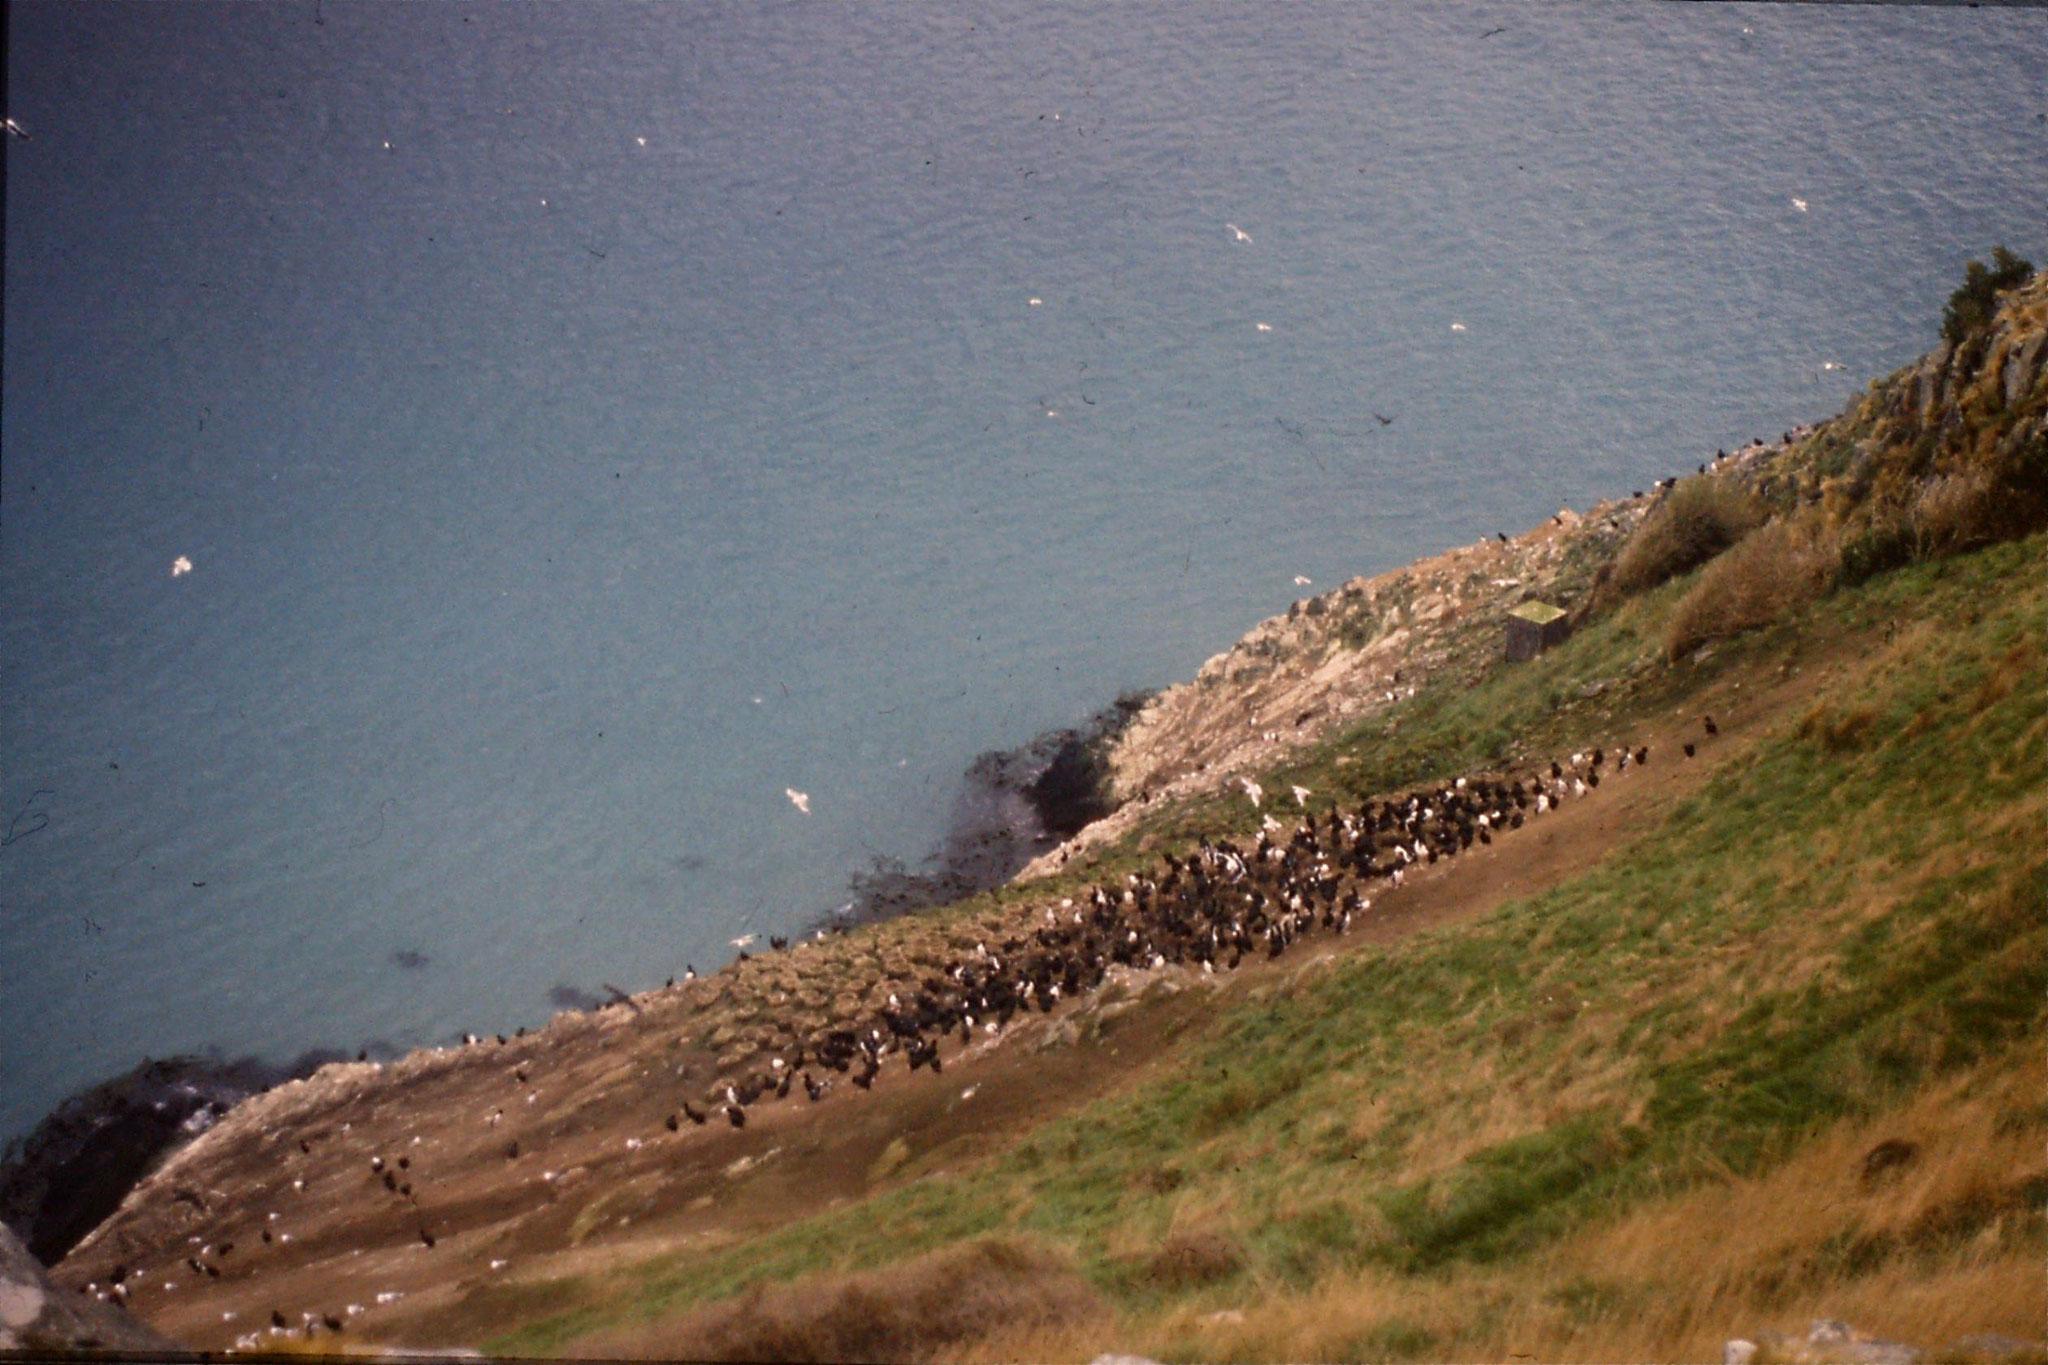 18/8/1990: 12: Dunedin, albatross colony